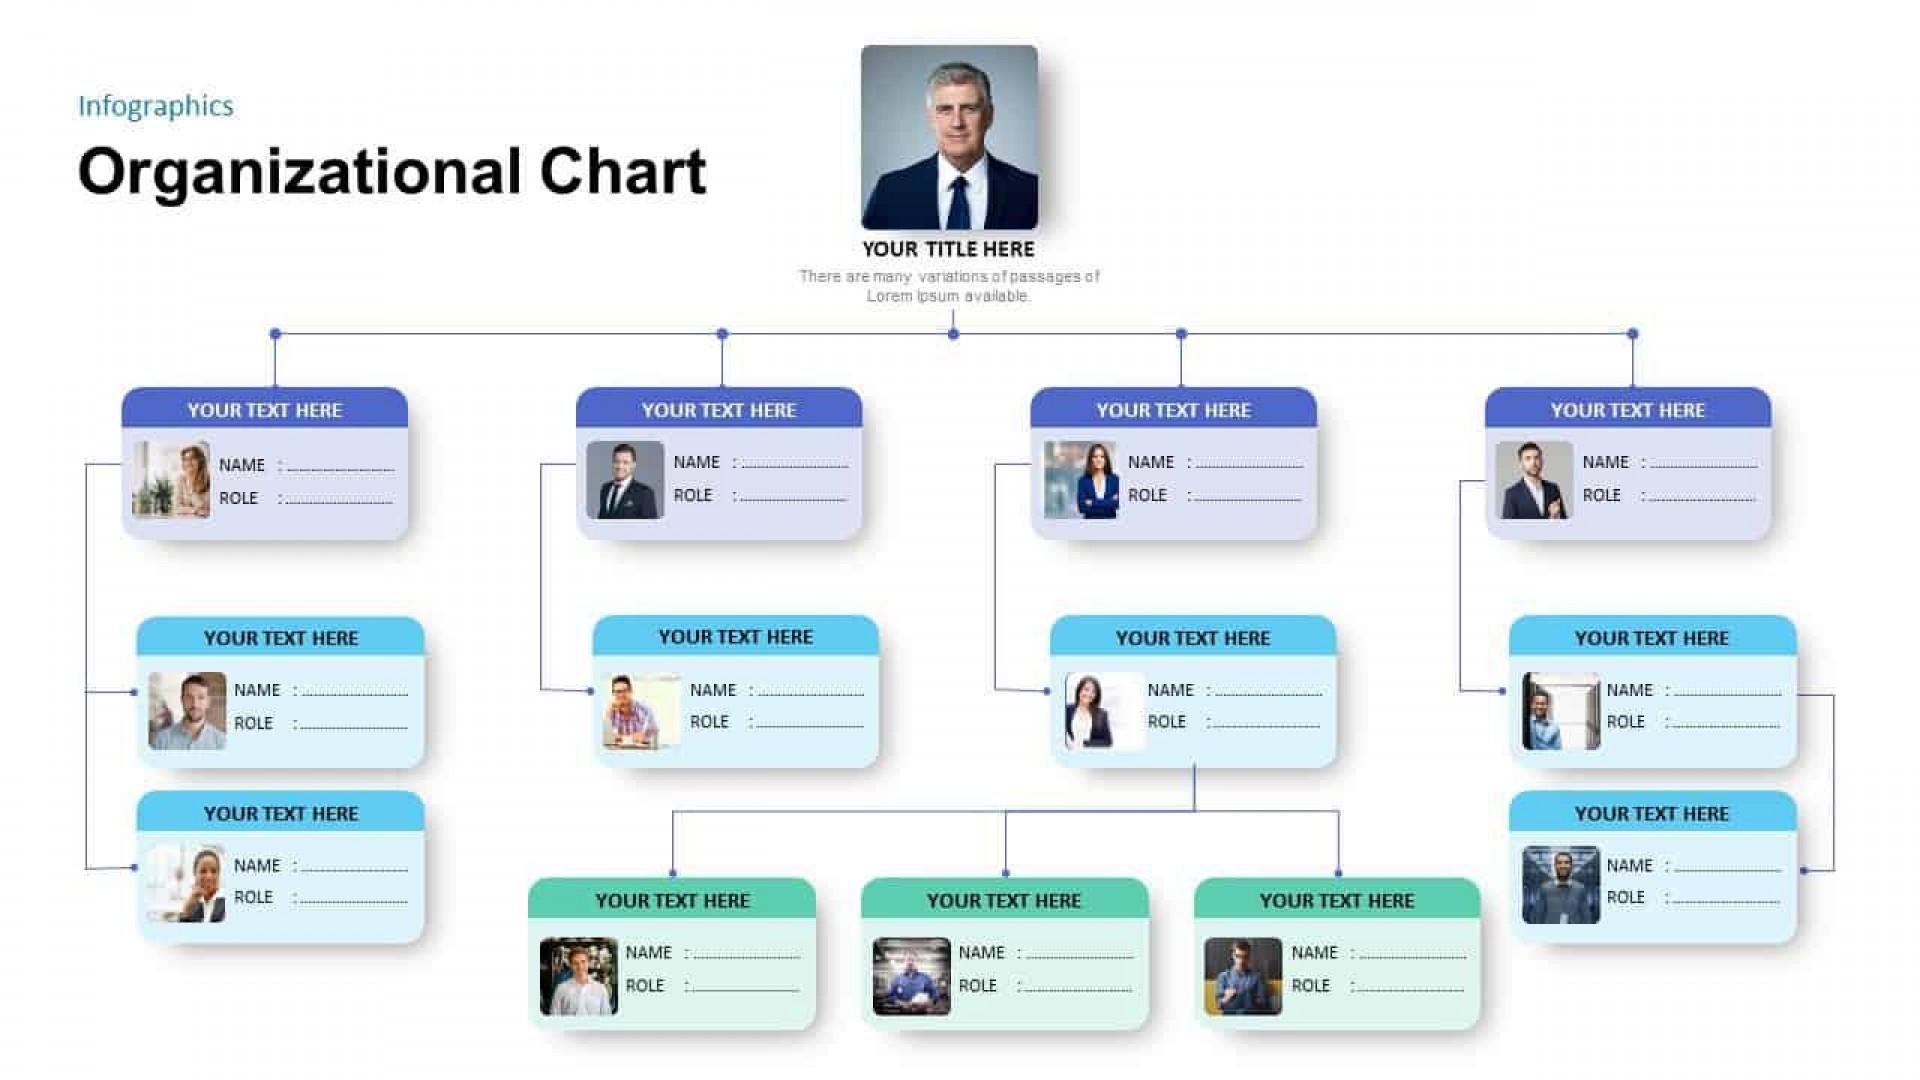 008 Astounding Organizational Chart Template Powerpoint Free High Def  Download 2010 Organization1920